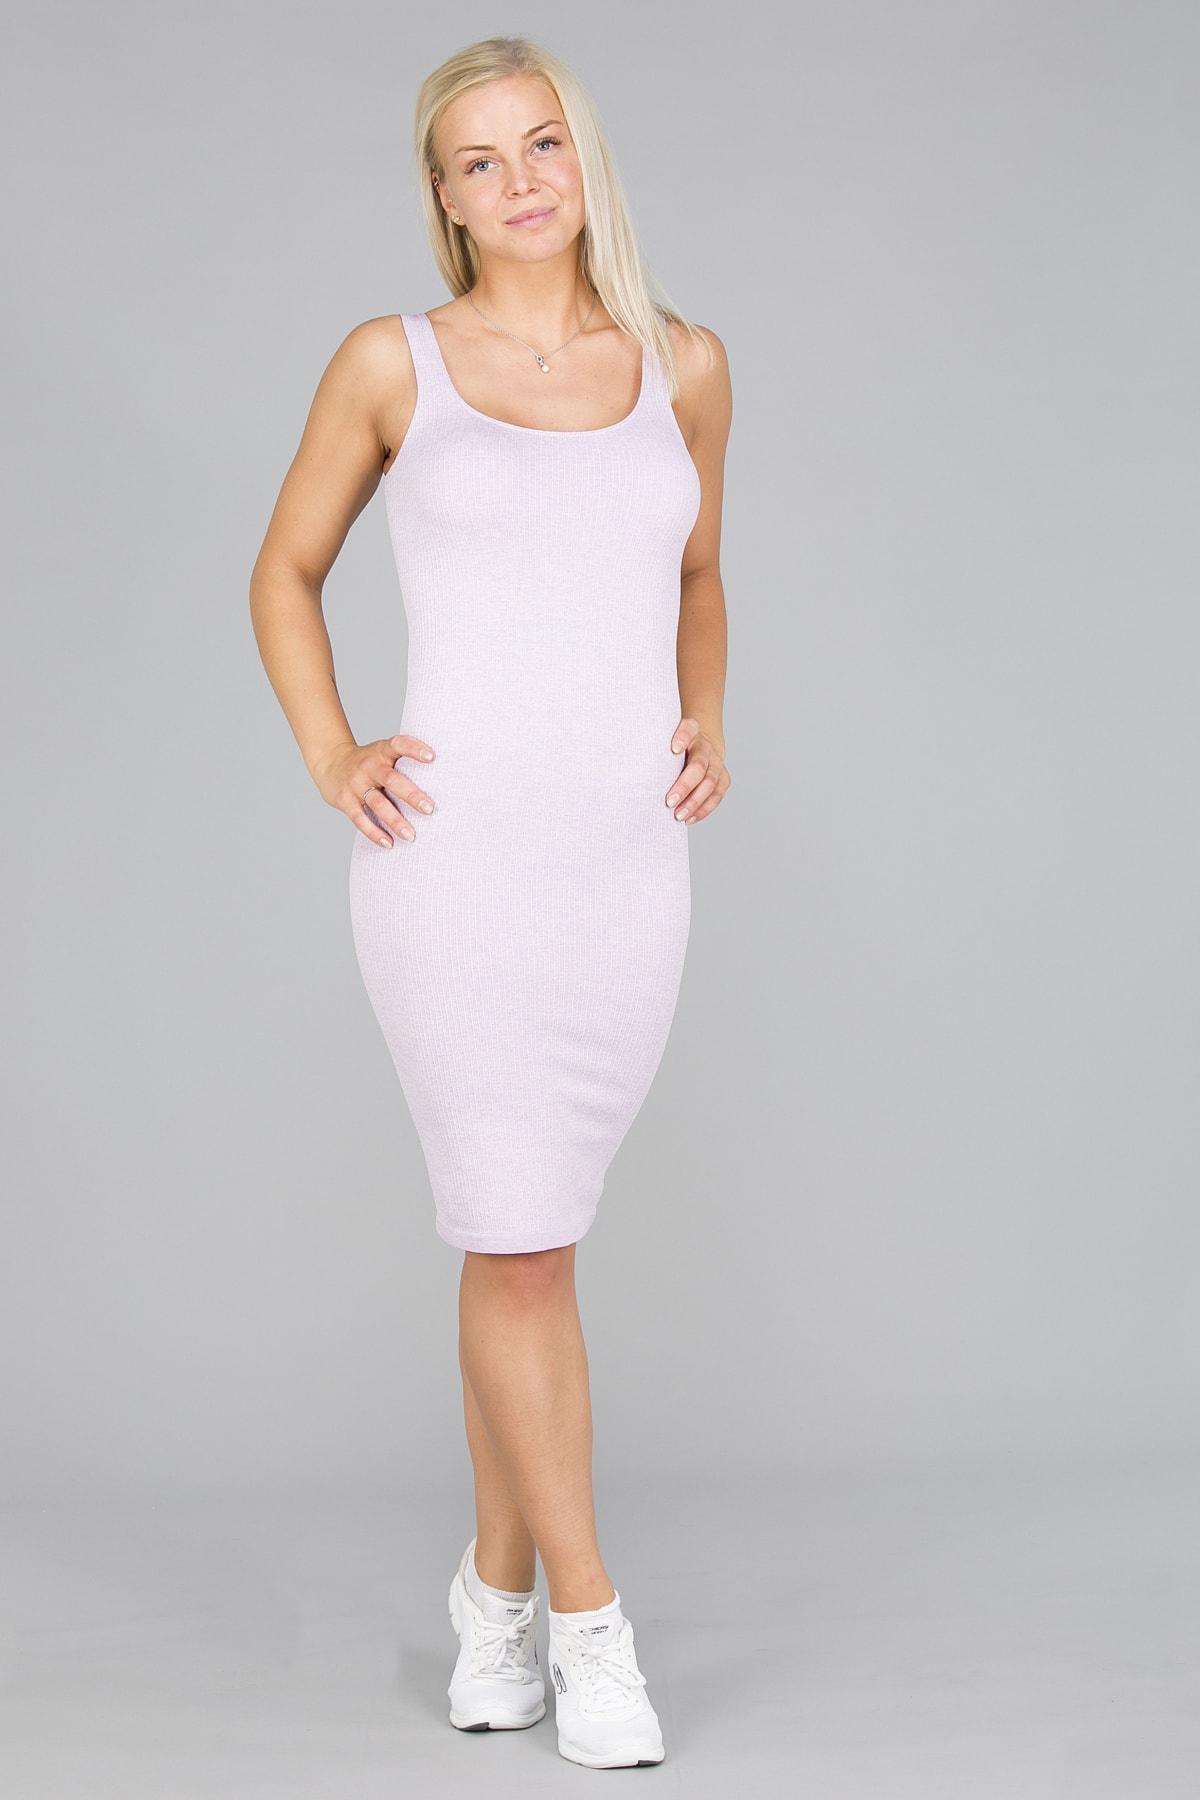 Aim'n Purple Ribbed Seamless Dress7